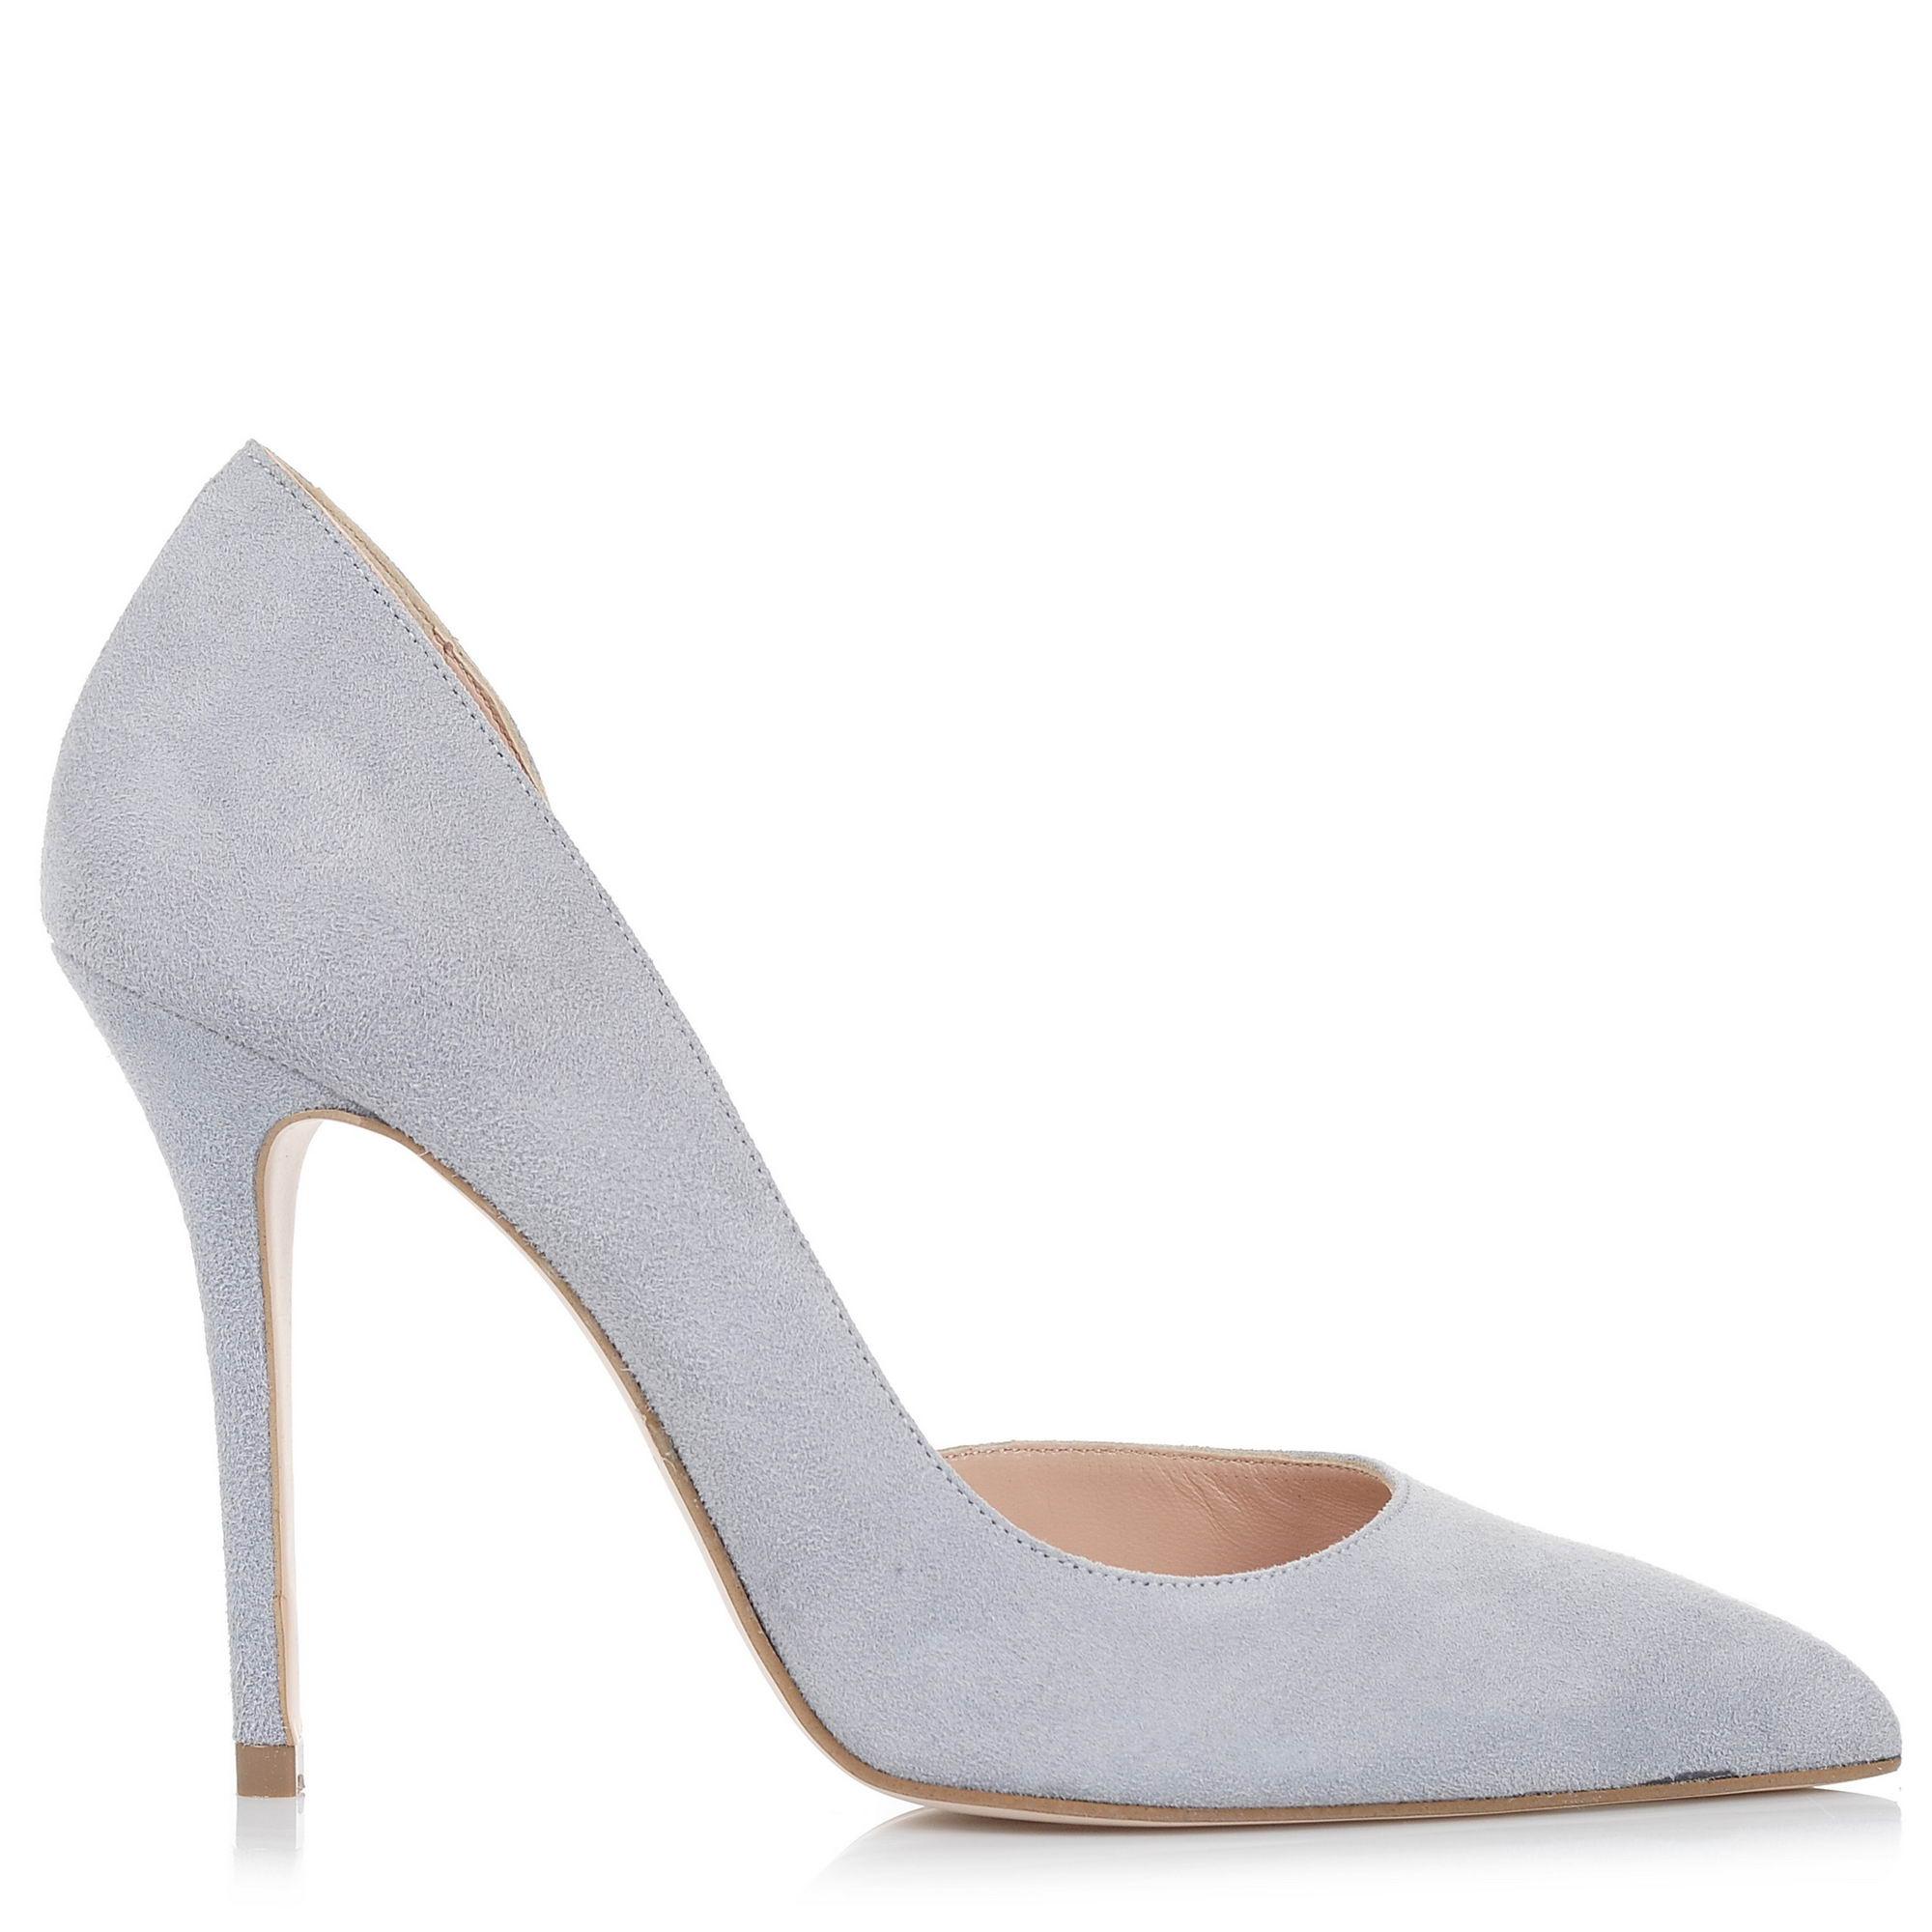 Suede Δερμάτινες Γόβες Mourtzi 10/100472 γυναικα   γυναικείο παπούτσι